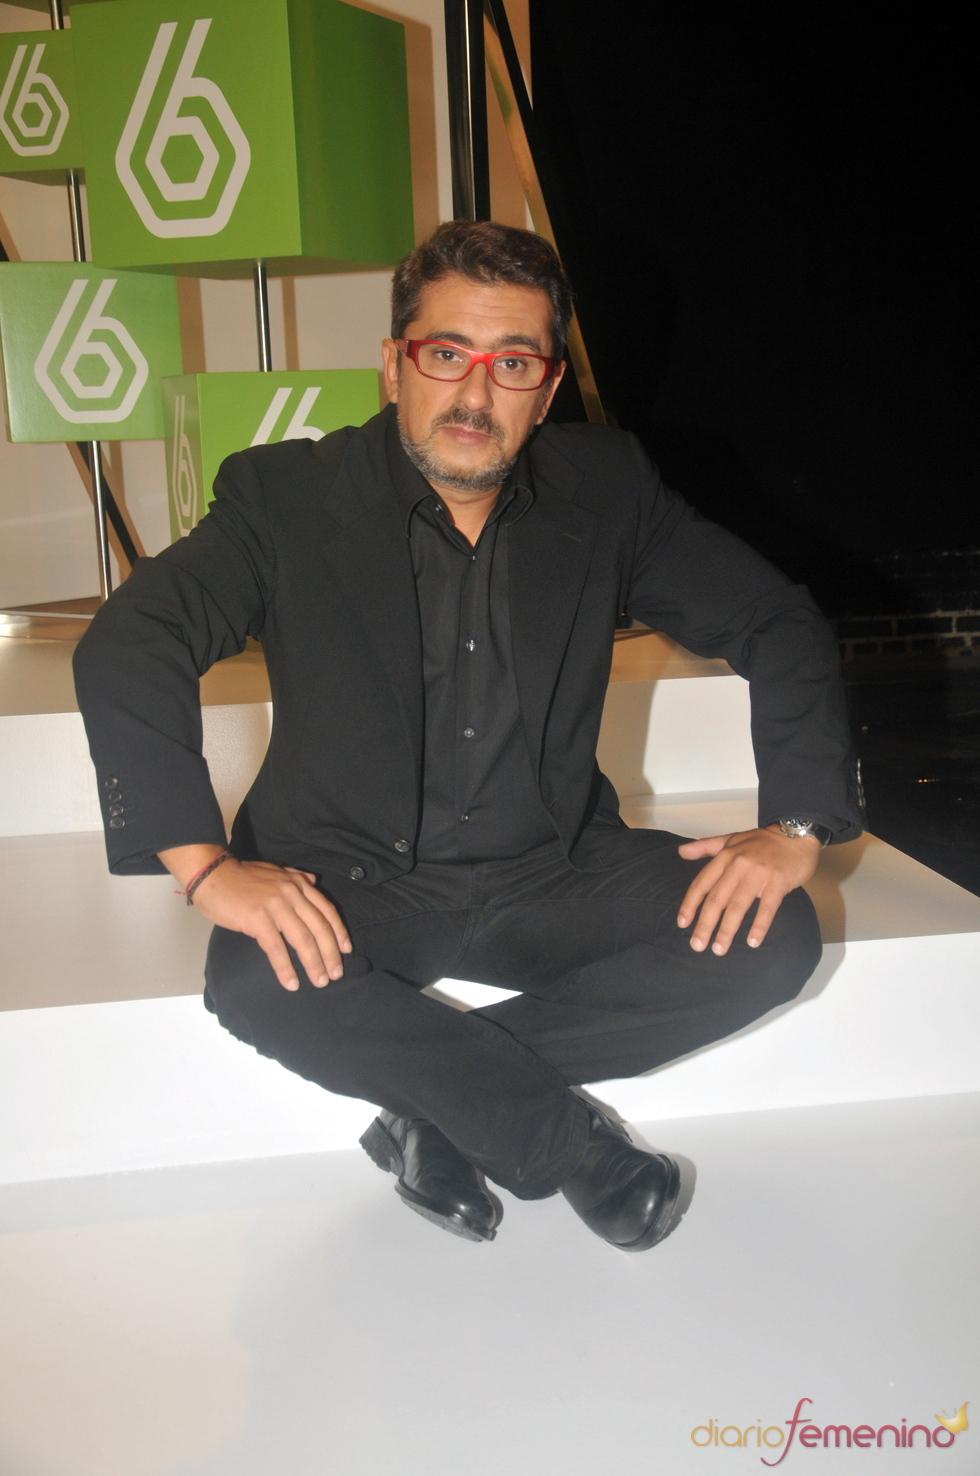 El presentador de La Sexta Andreu Buenafuente